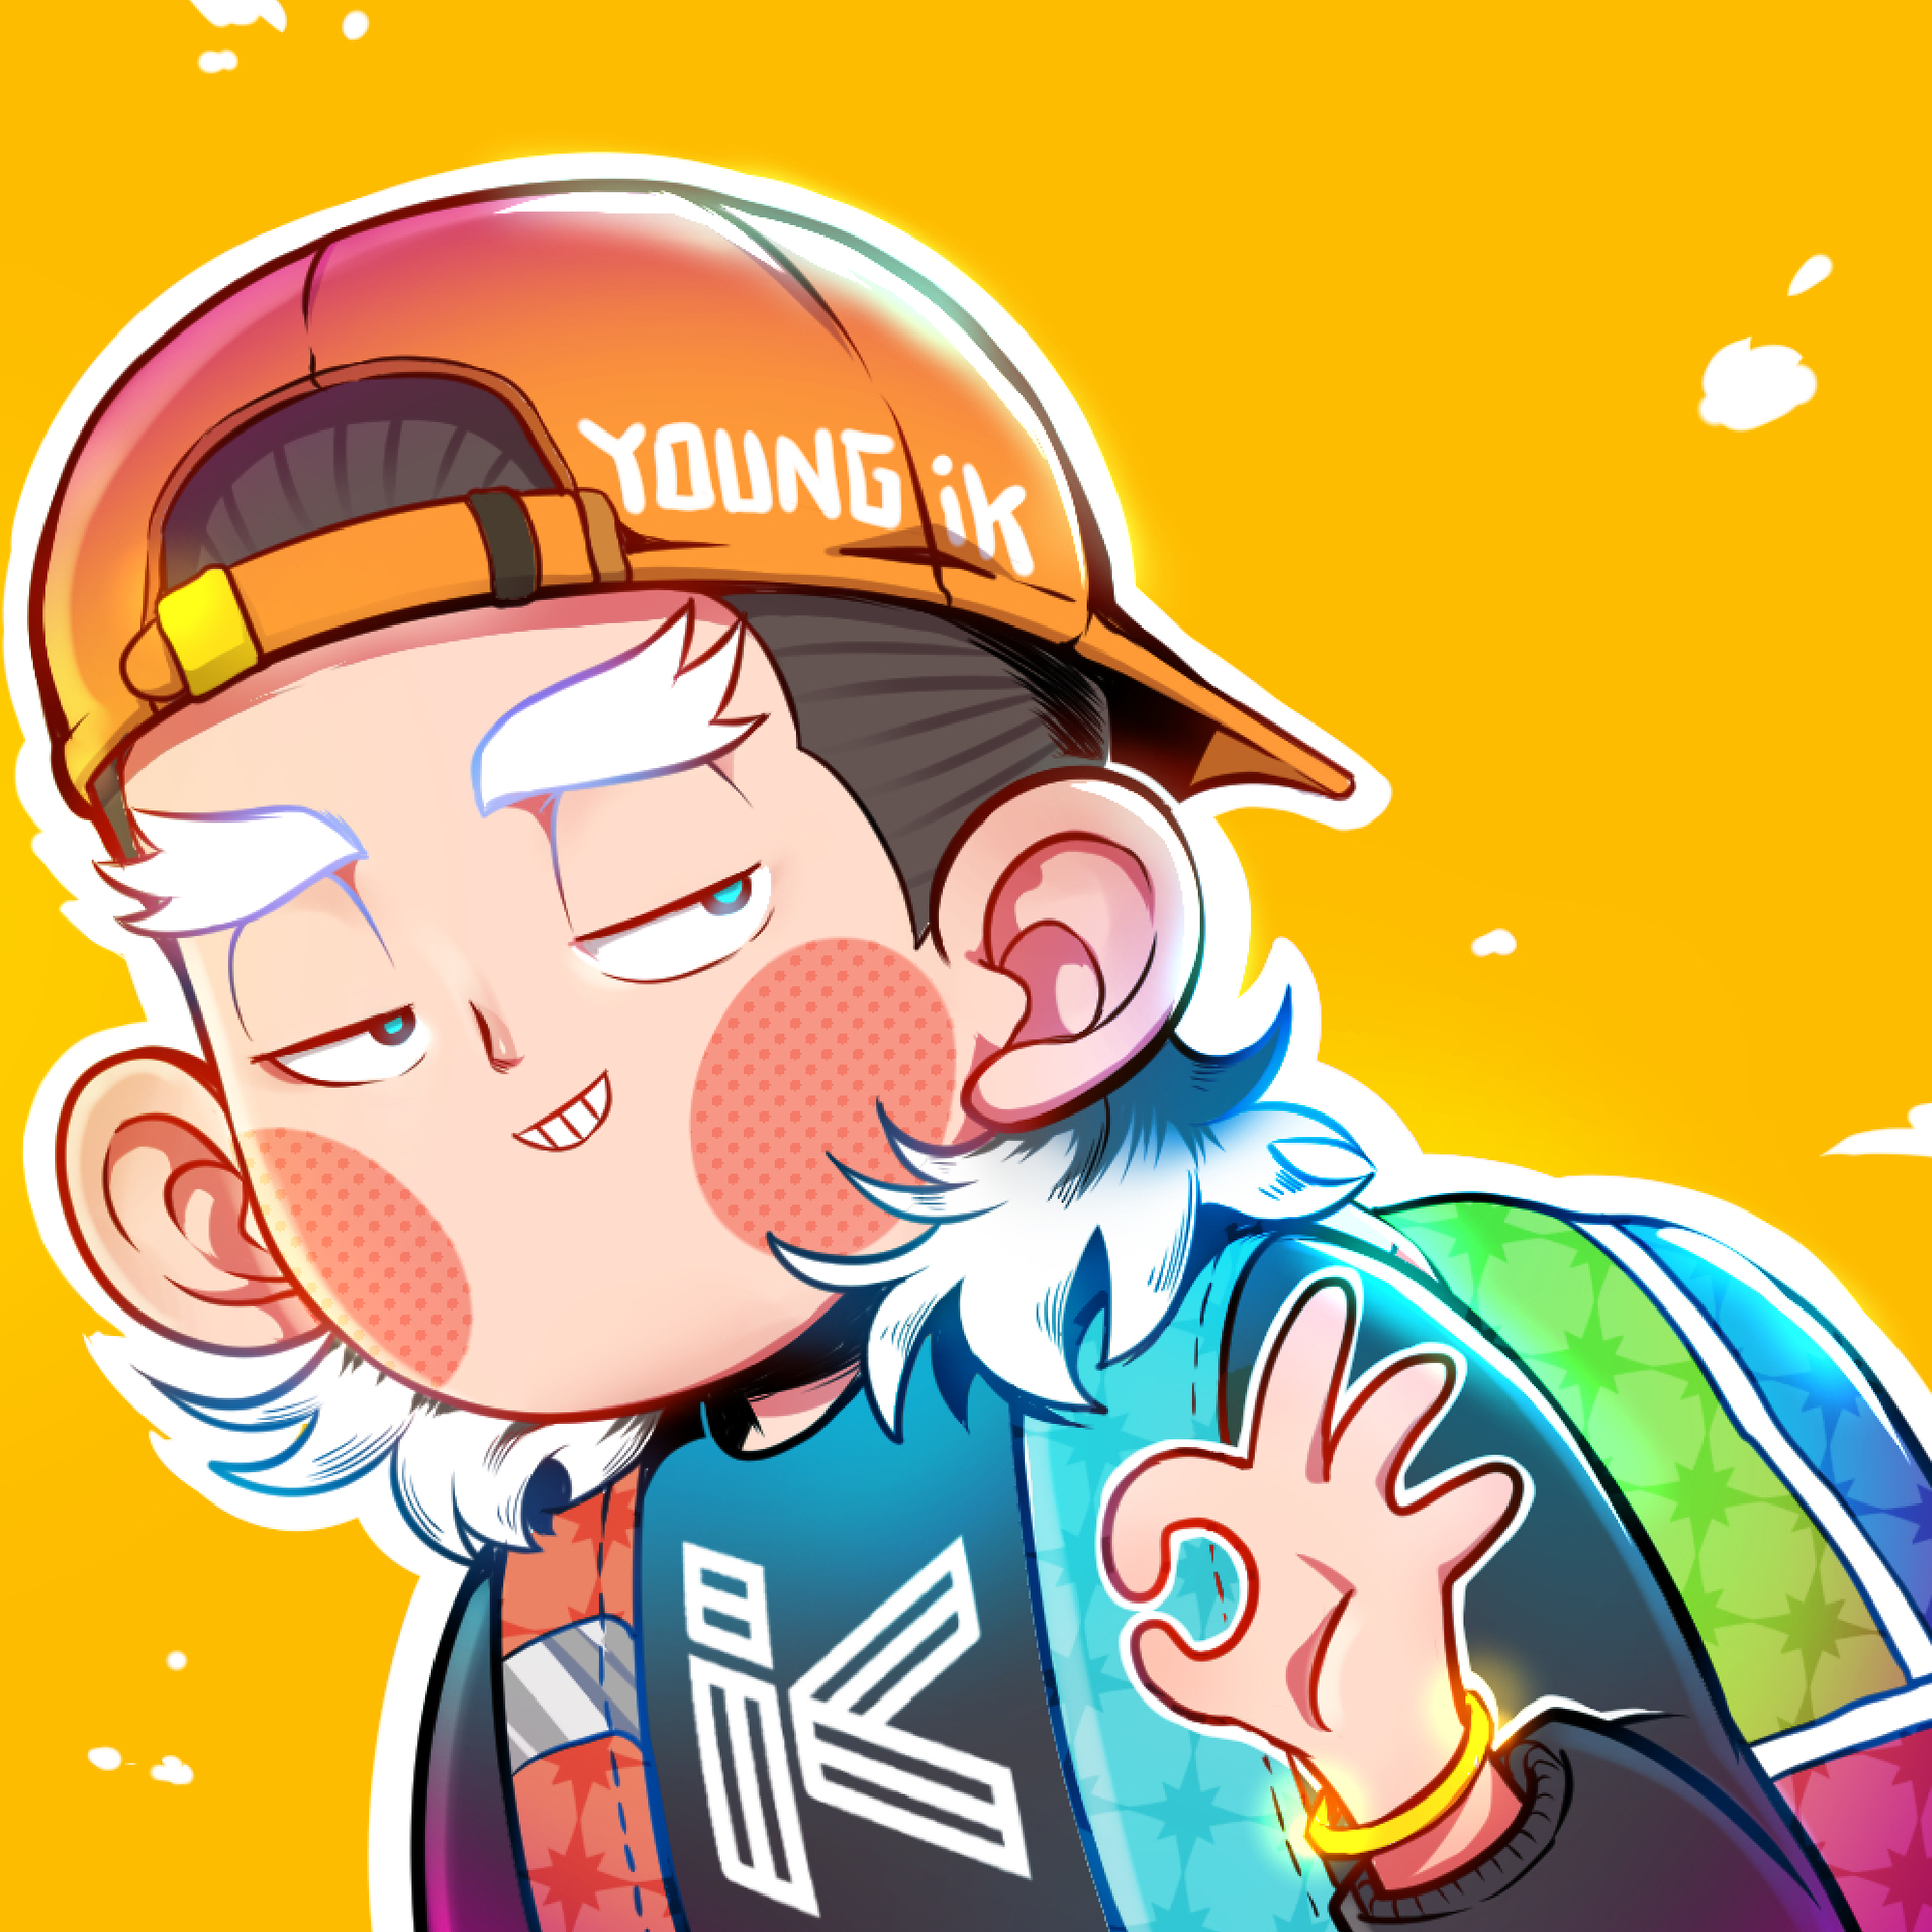 YOUNGiKE